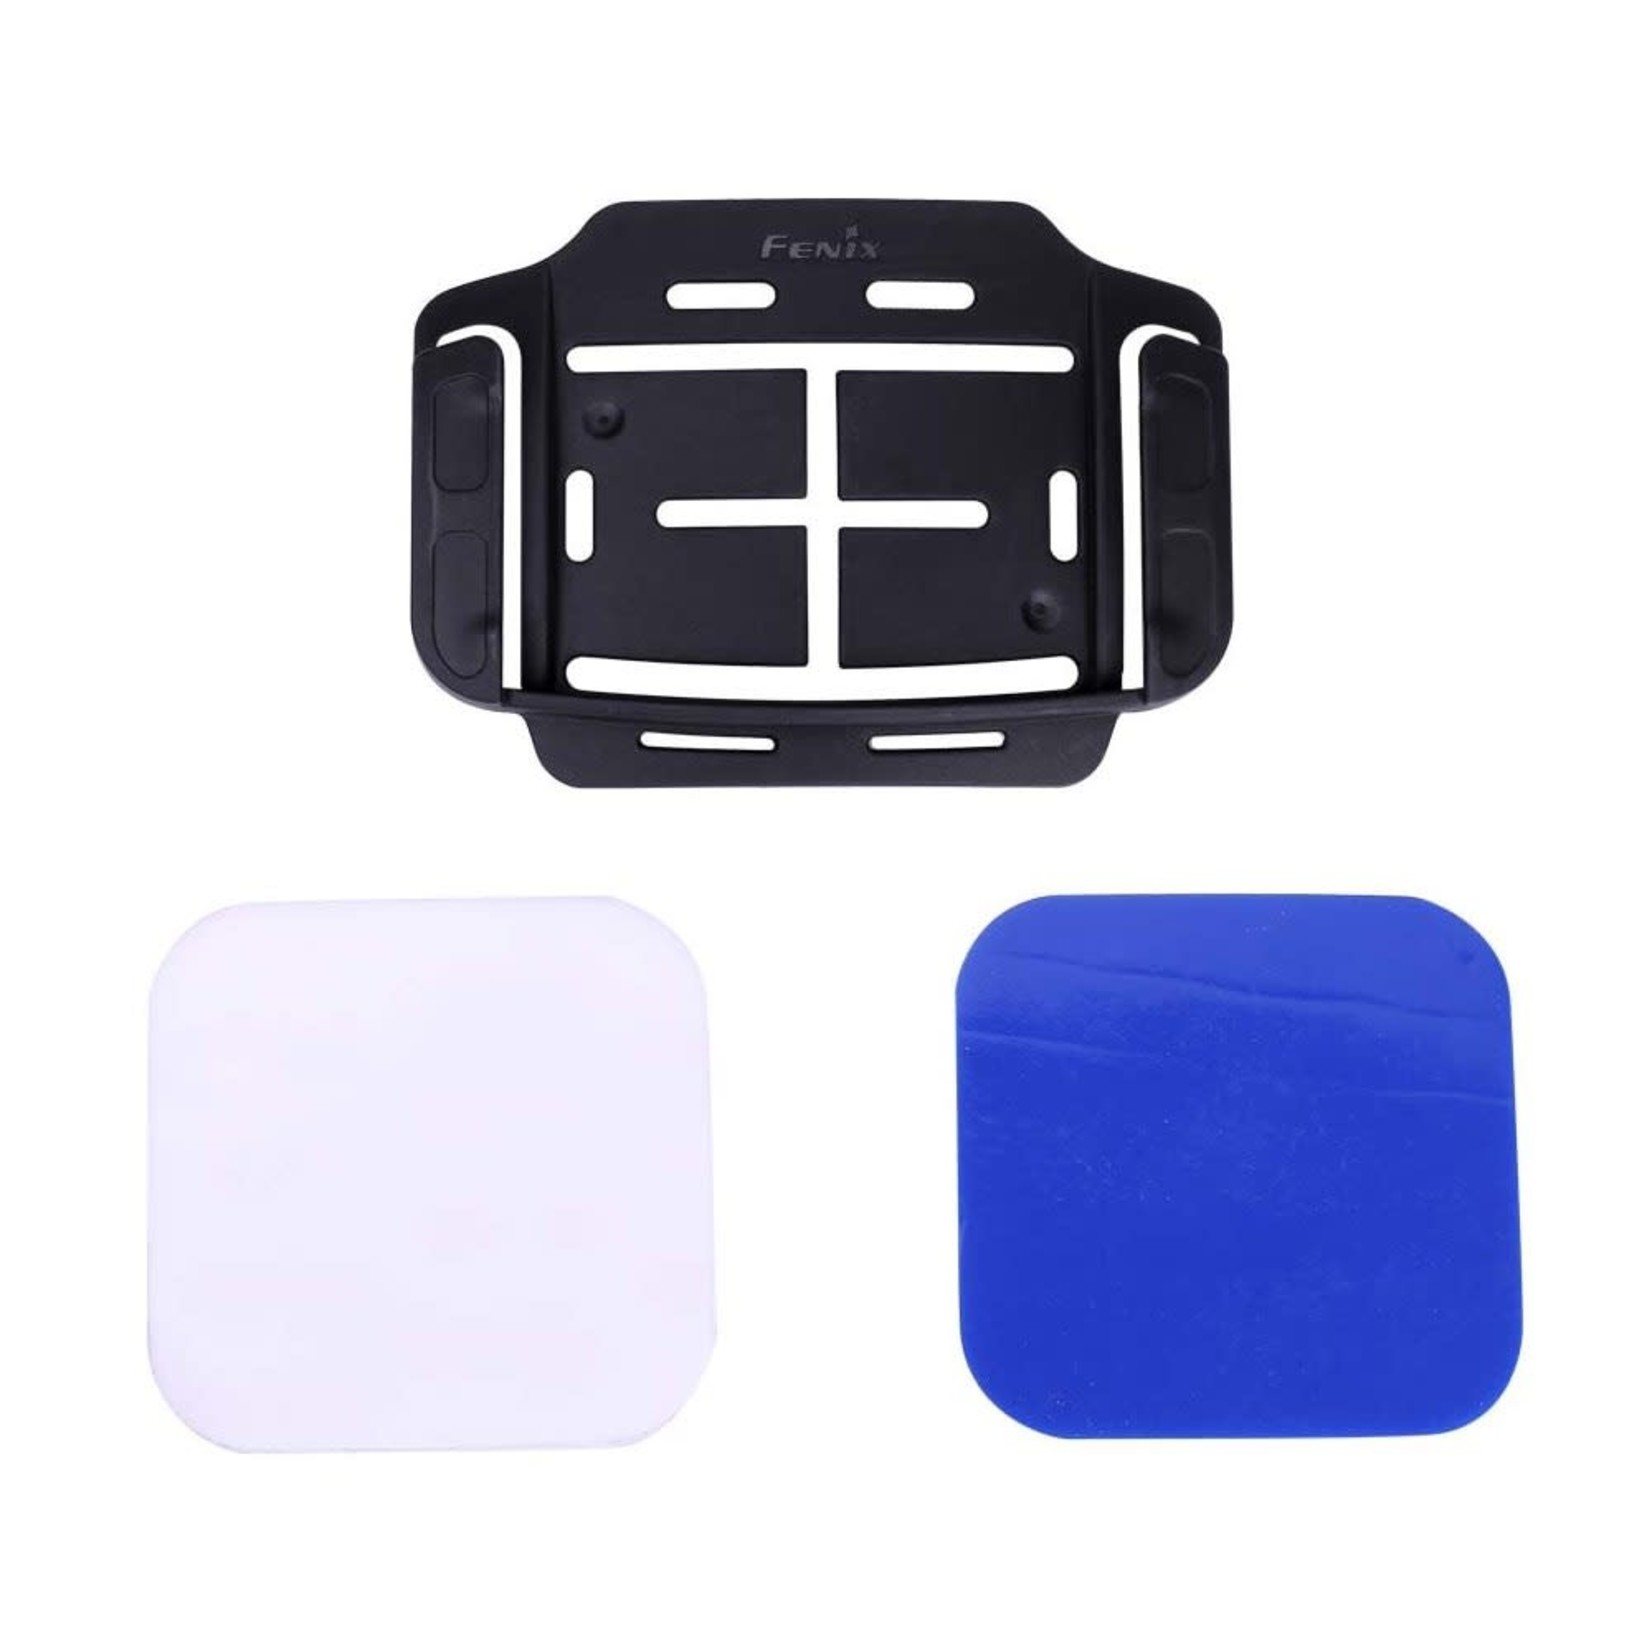 Fenix Fenix ALG-03 Headlamp Attachment